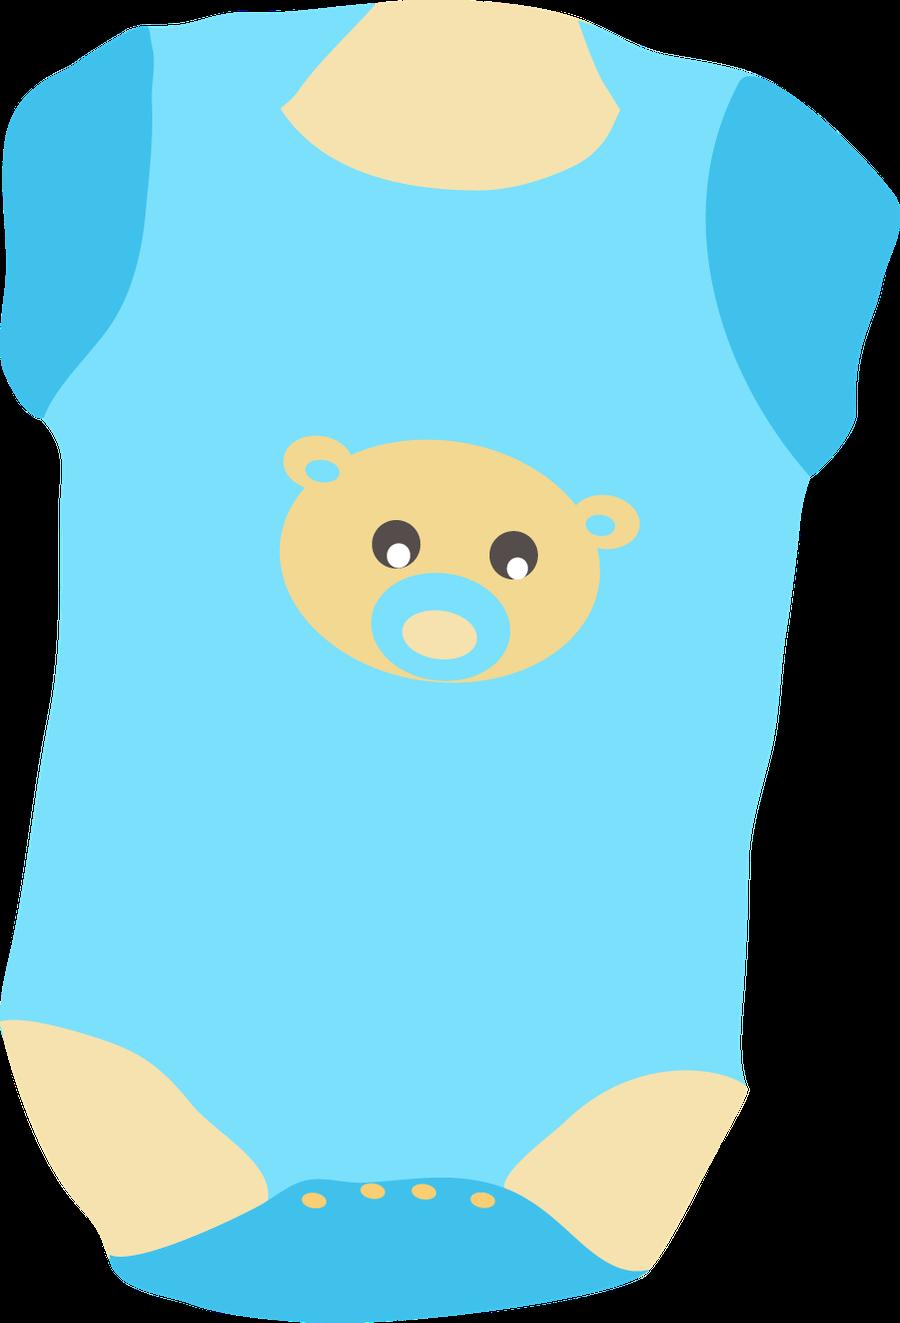 Beb menino e menina. Frames clipart clothes